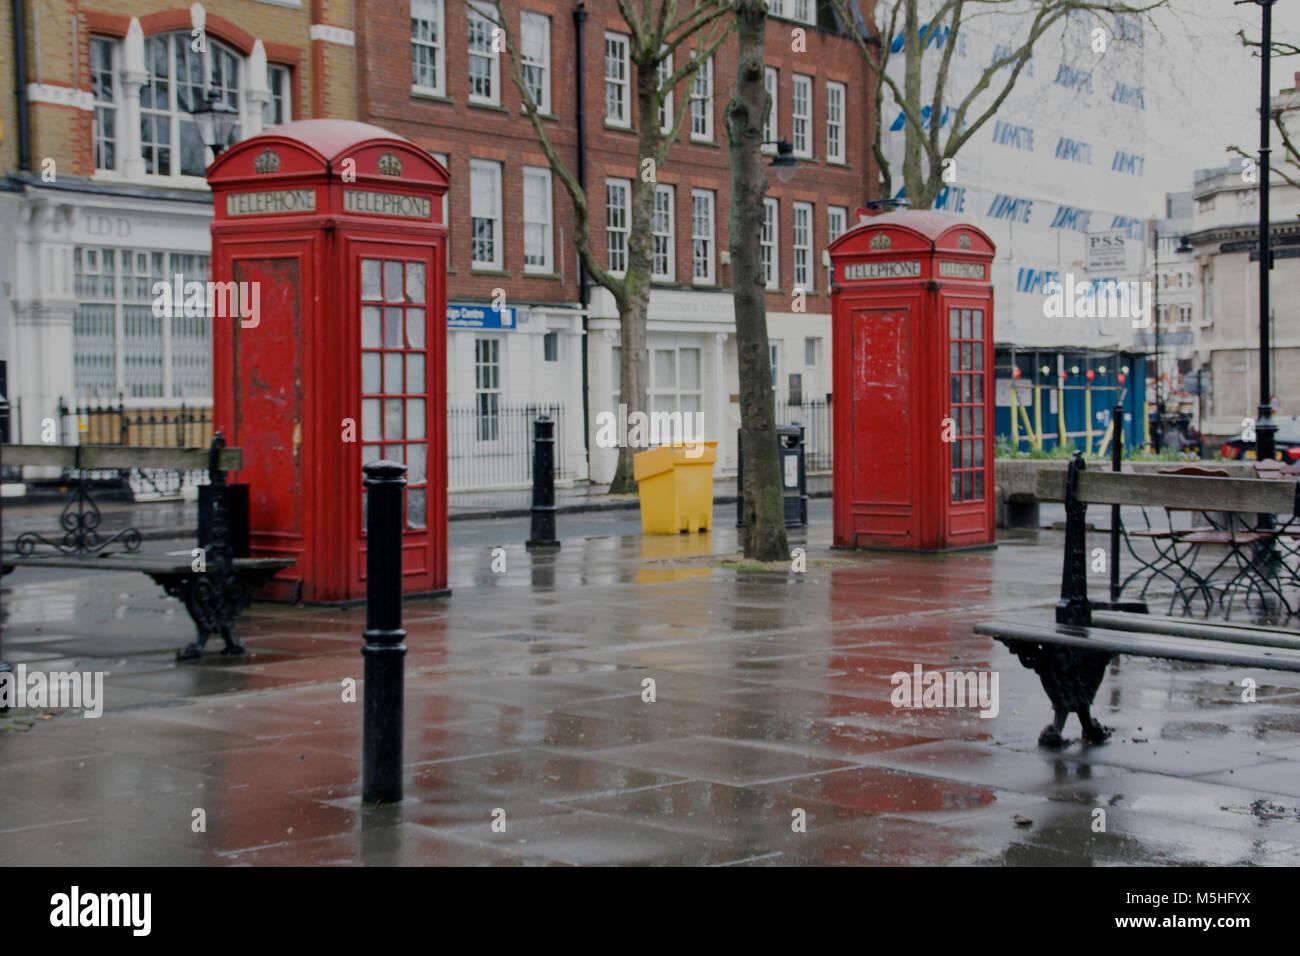 Red Telephone Boxs, Clerkenwell, London, England, UK. Credit: London Snapper - Stock Image